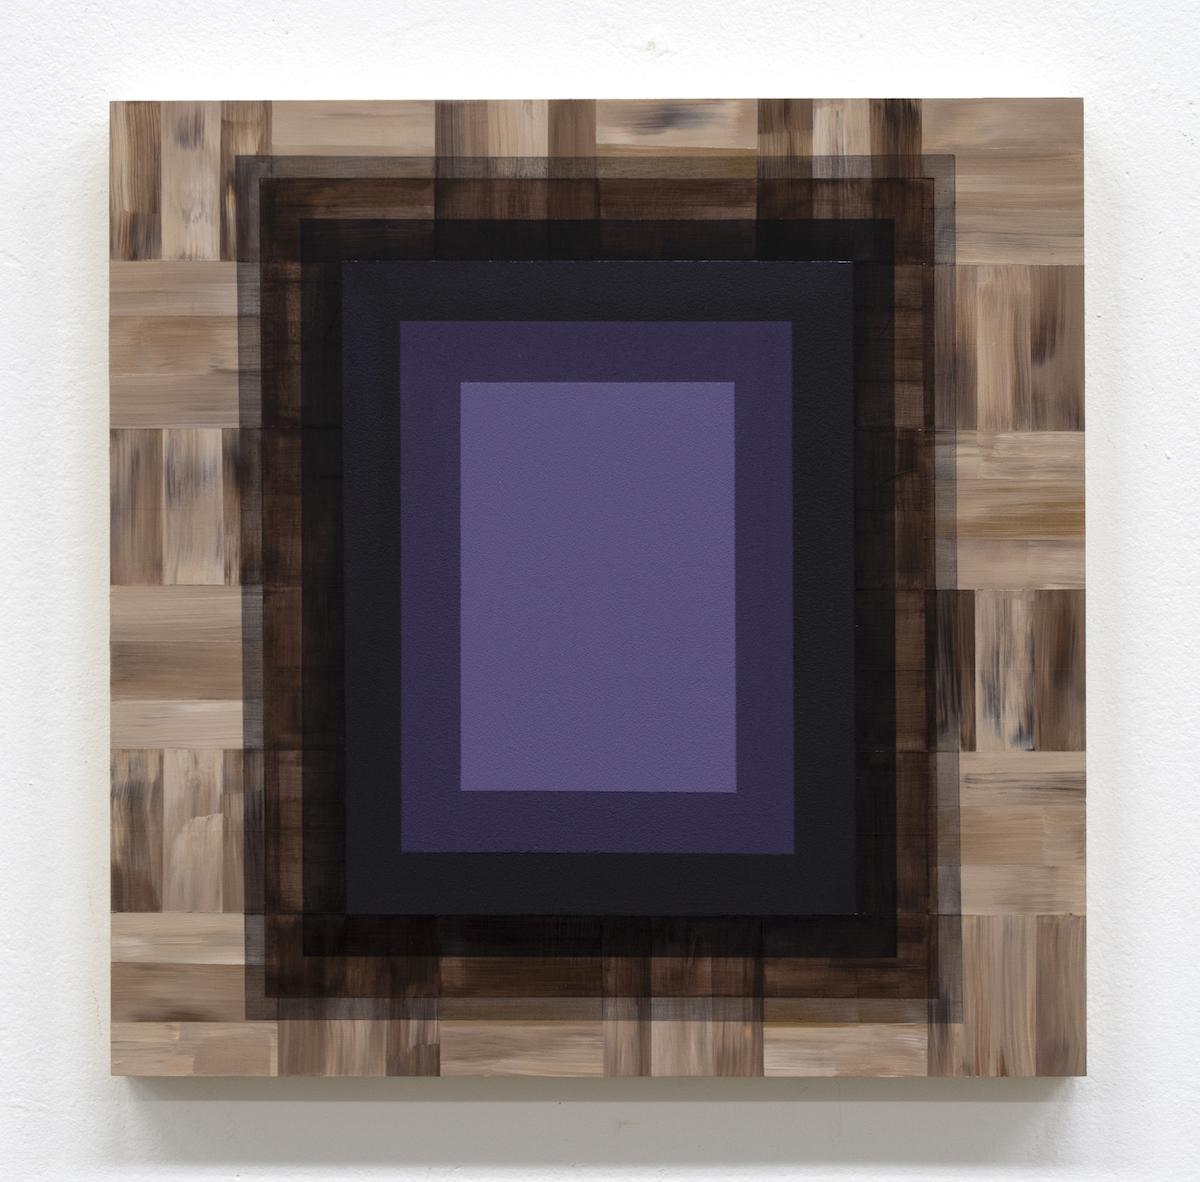 Mary Laube, My Lunar Plexus, acrylic on panel, 12